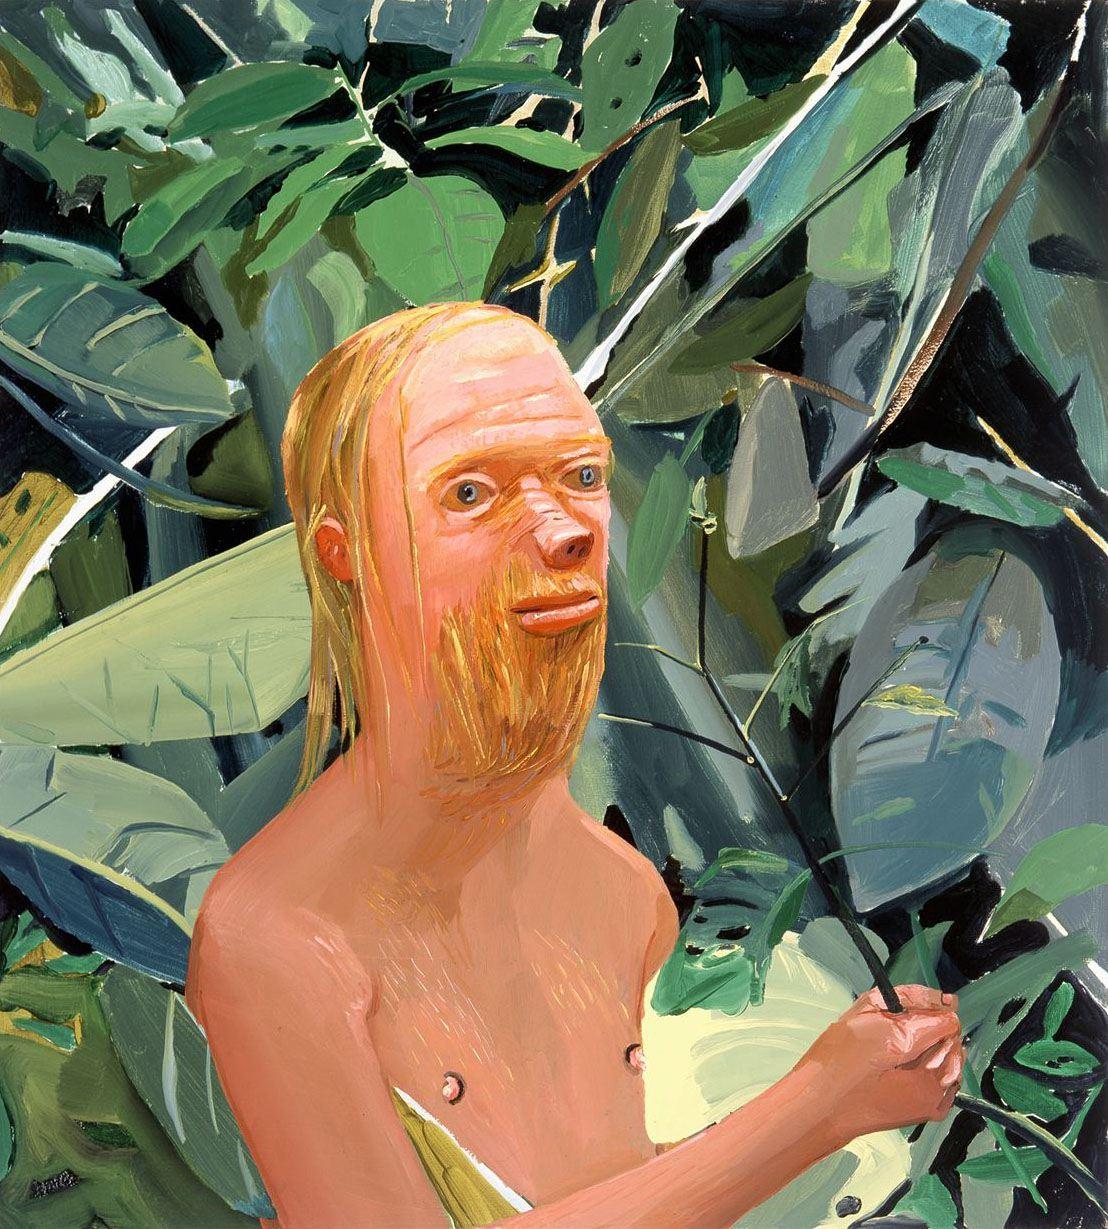 Dana Schutz FRANK AS A PROBOSCIS MONKEY 2002 Oil on canvas 36 x 32 inches 91.4 x 81.3 centimeters Courtesy Petzel Gallery CR# DS.36741